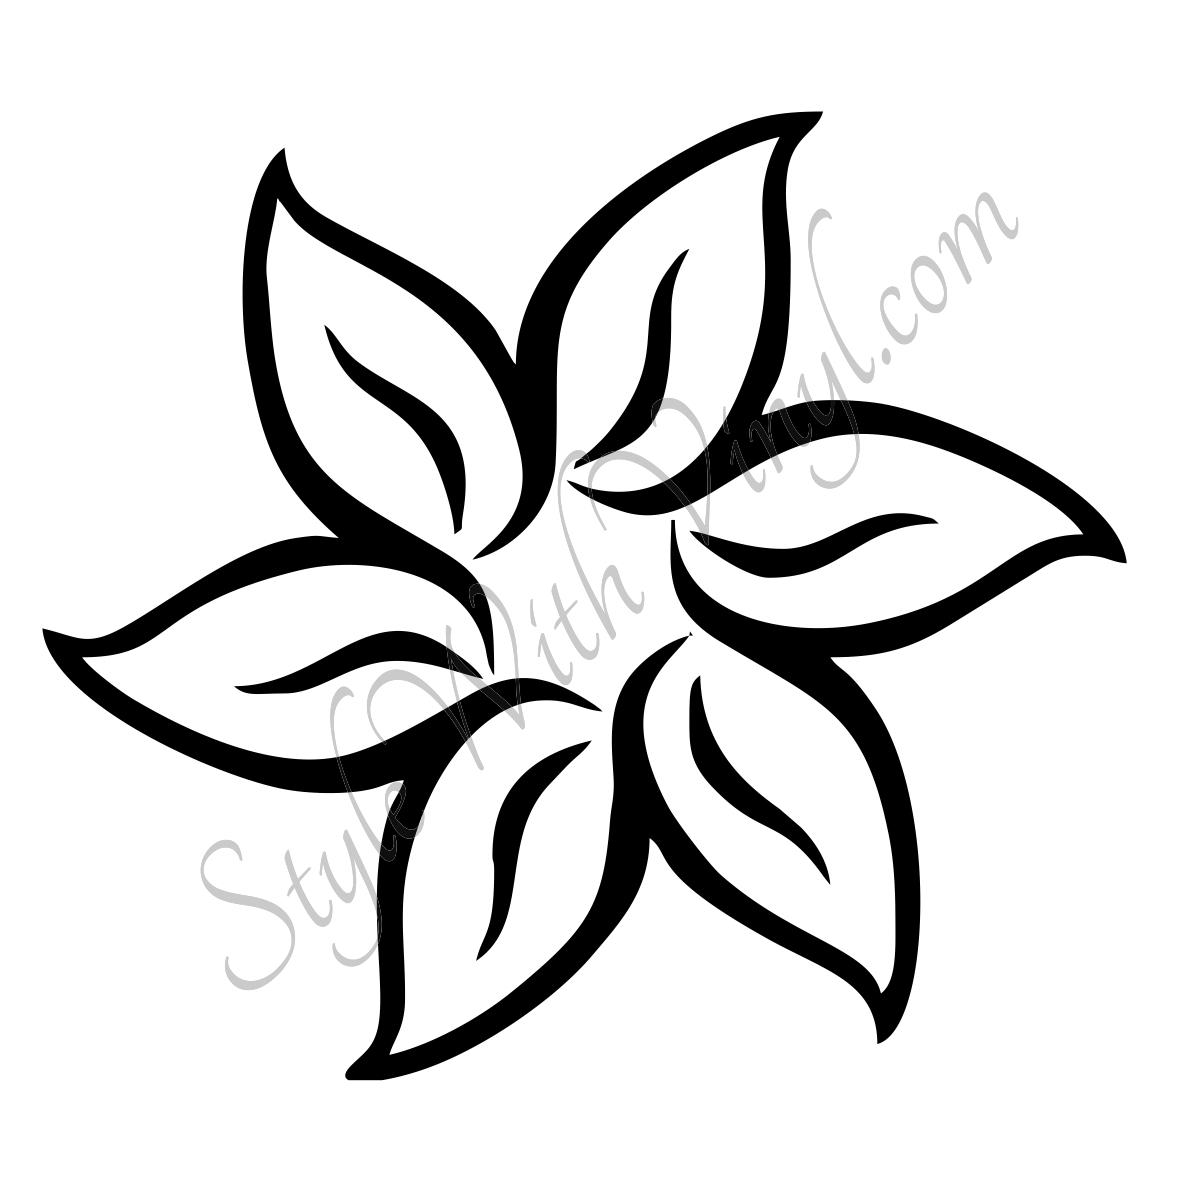 1200x1200 Simple Flower Drawing Ideas Simple Flower Drawing Ideas Draw Easy